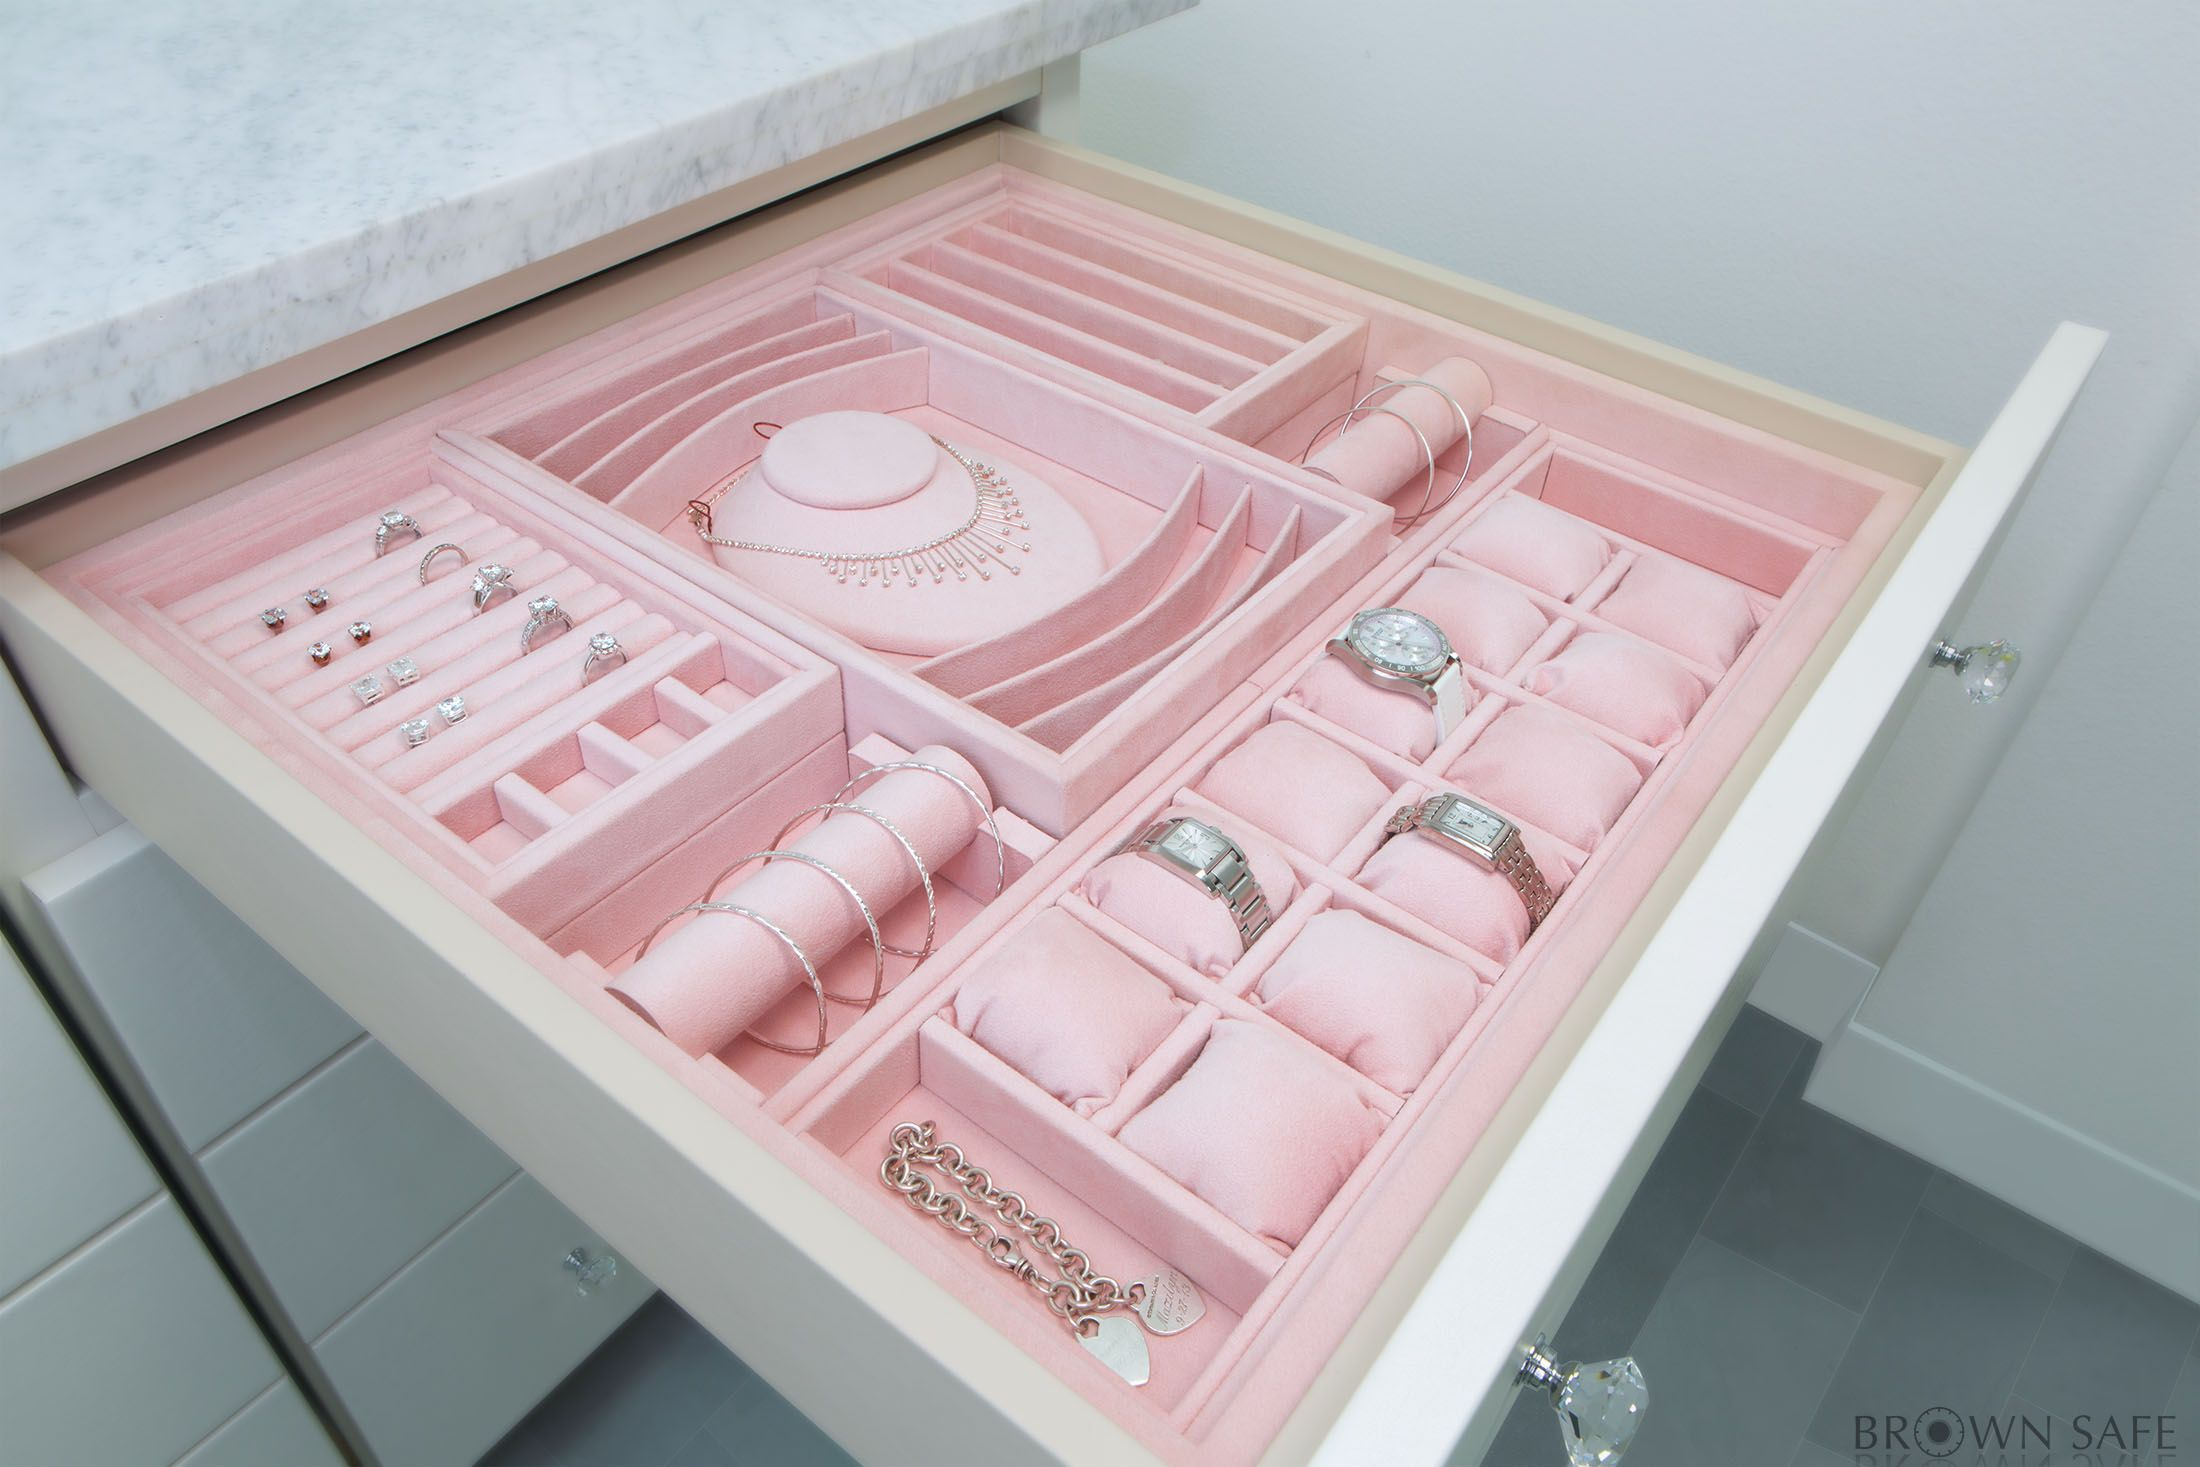 Jewelry inserts for drawers keep your jewelry pristine organized